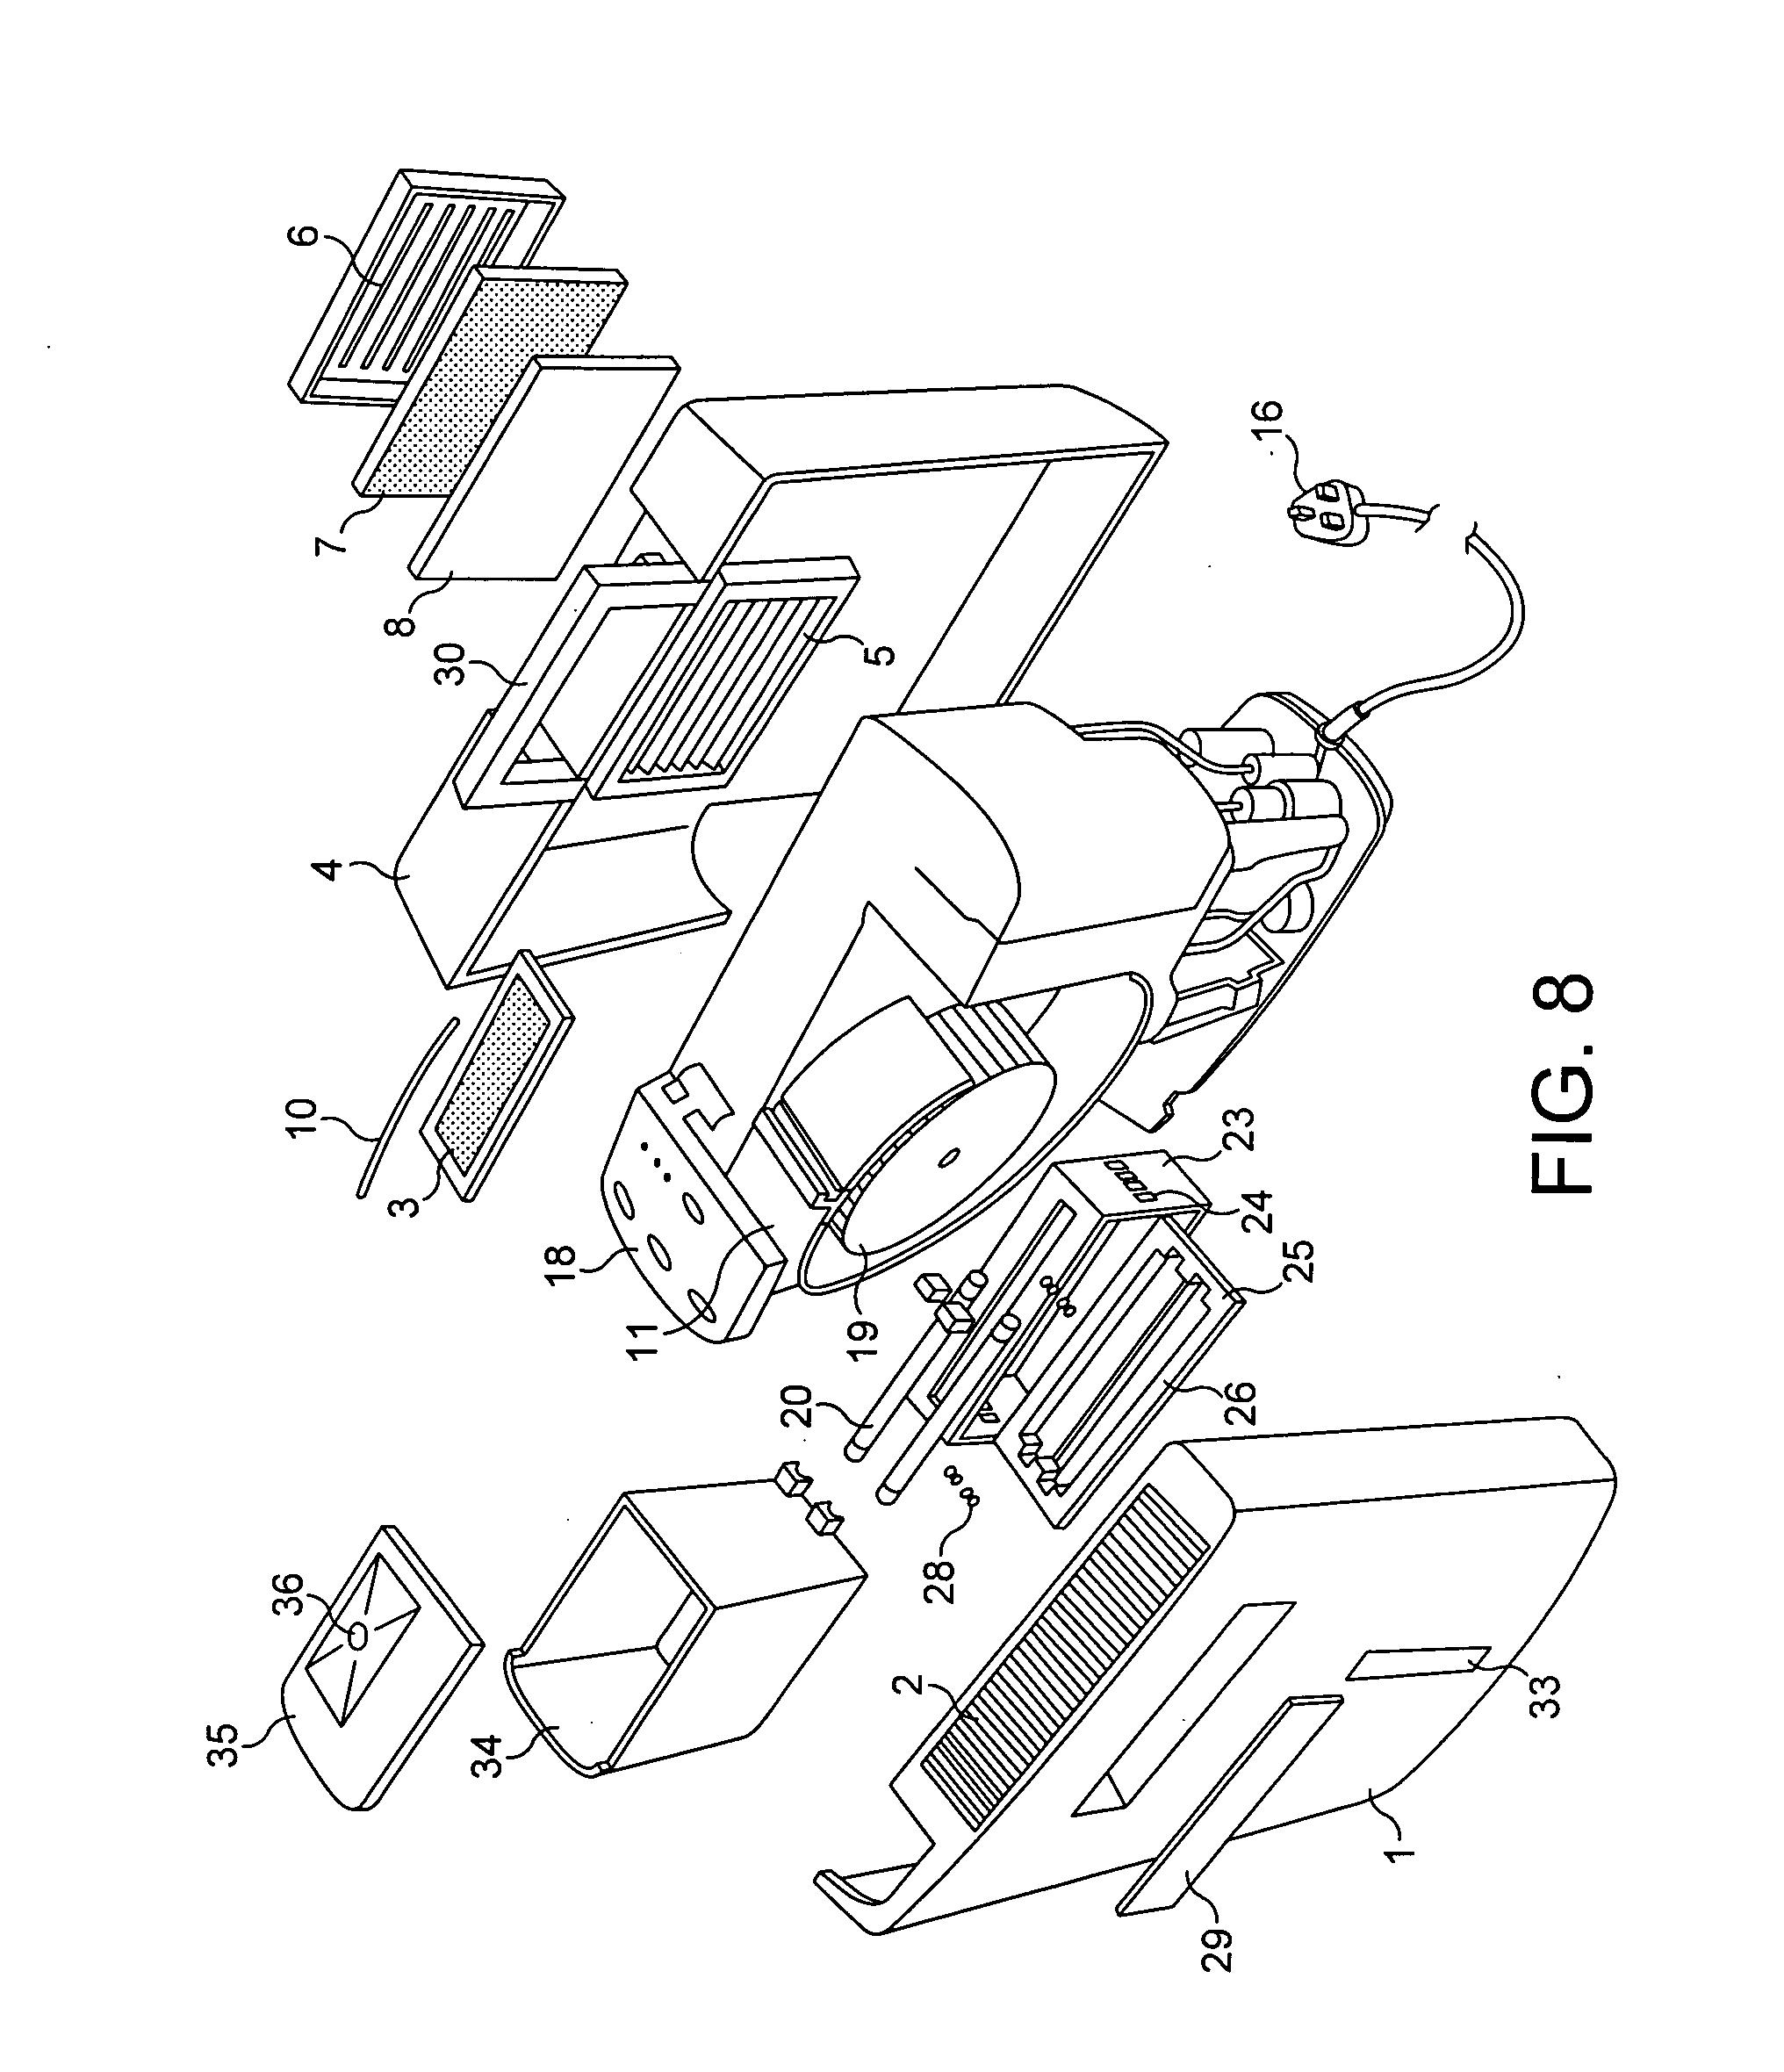 Square D 2601Ag2 Wiring Diagram Database